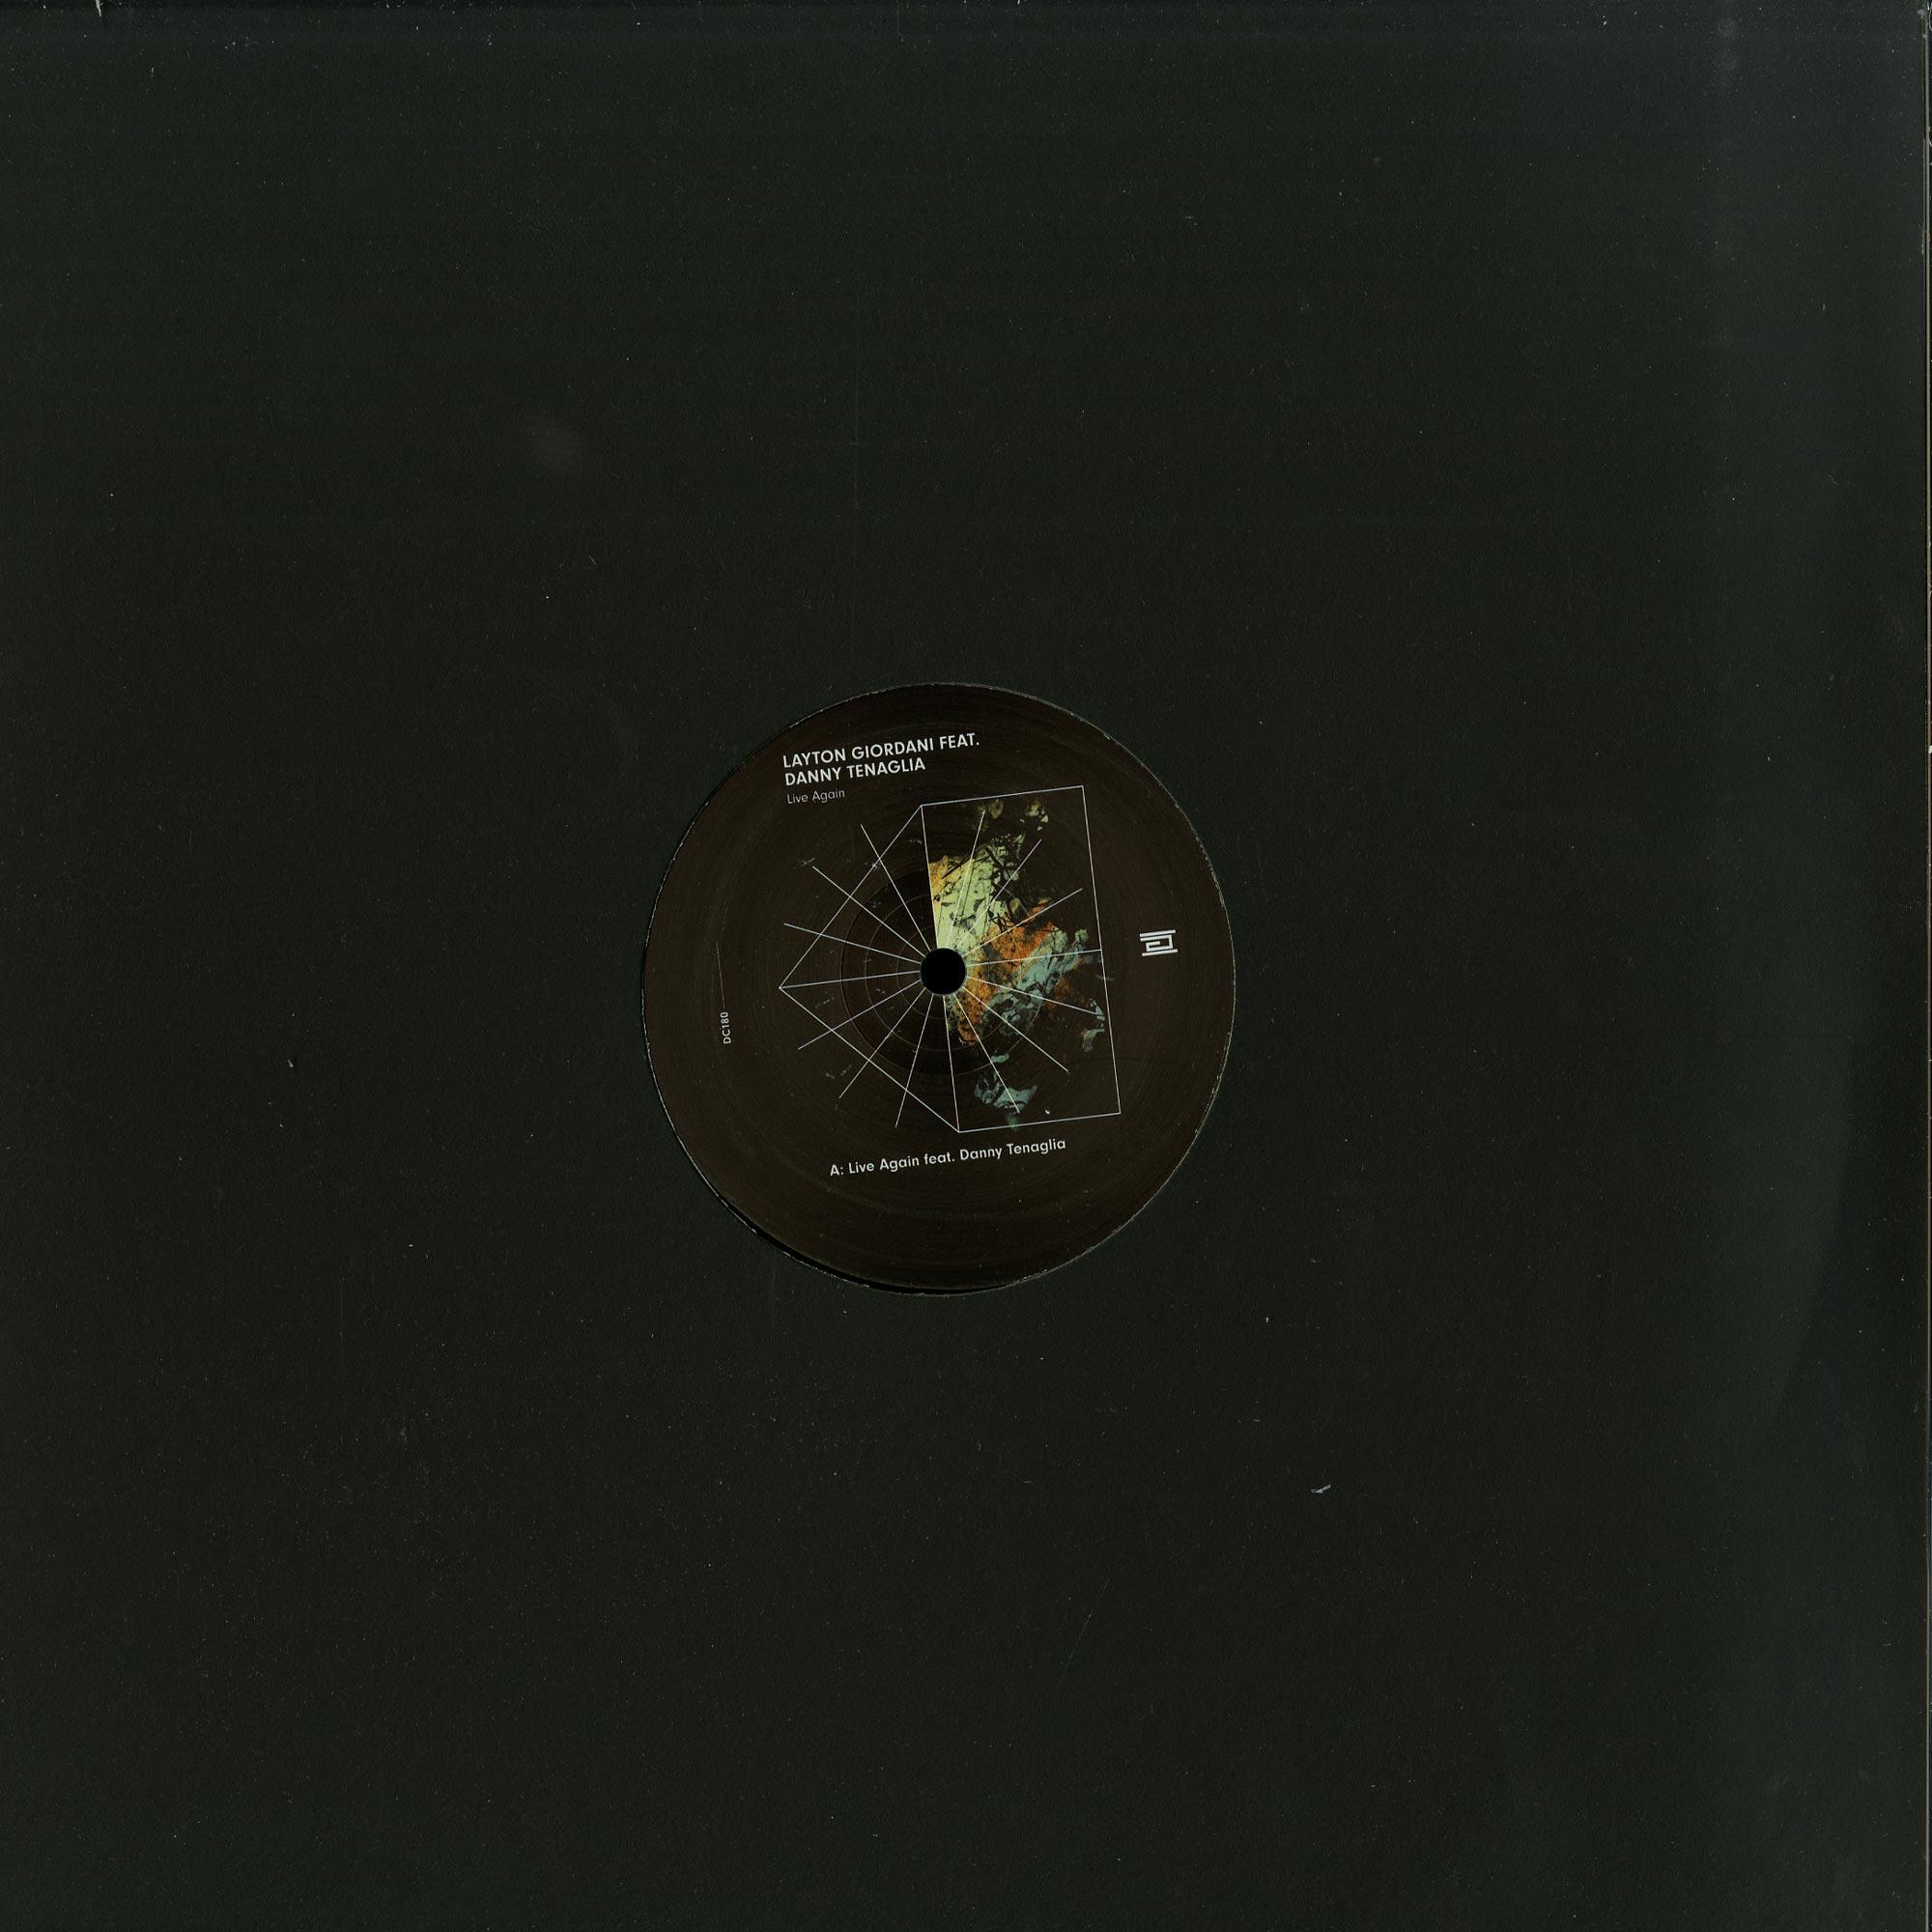 Layton Giordani Feat. Danny Tenaglia - LIVE AGAIN